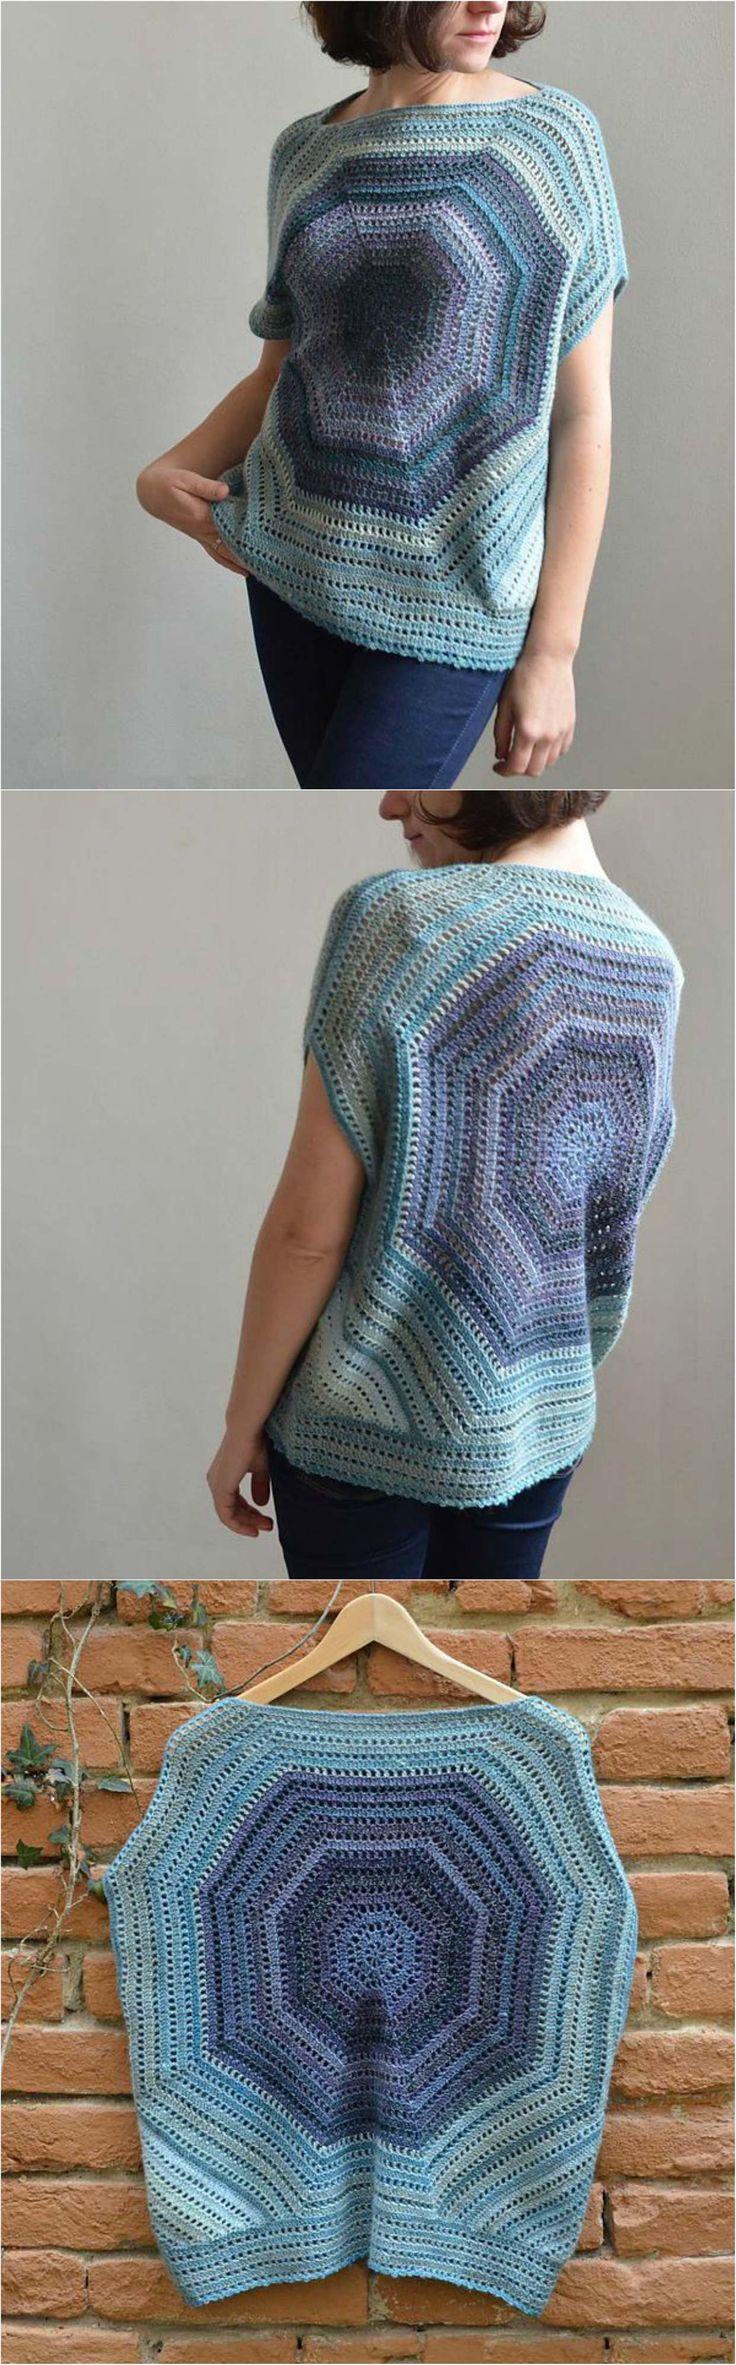 Crochet Beautiful Sweater